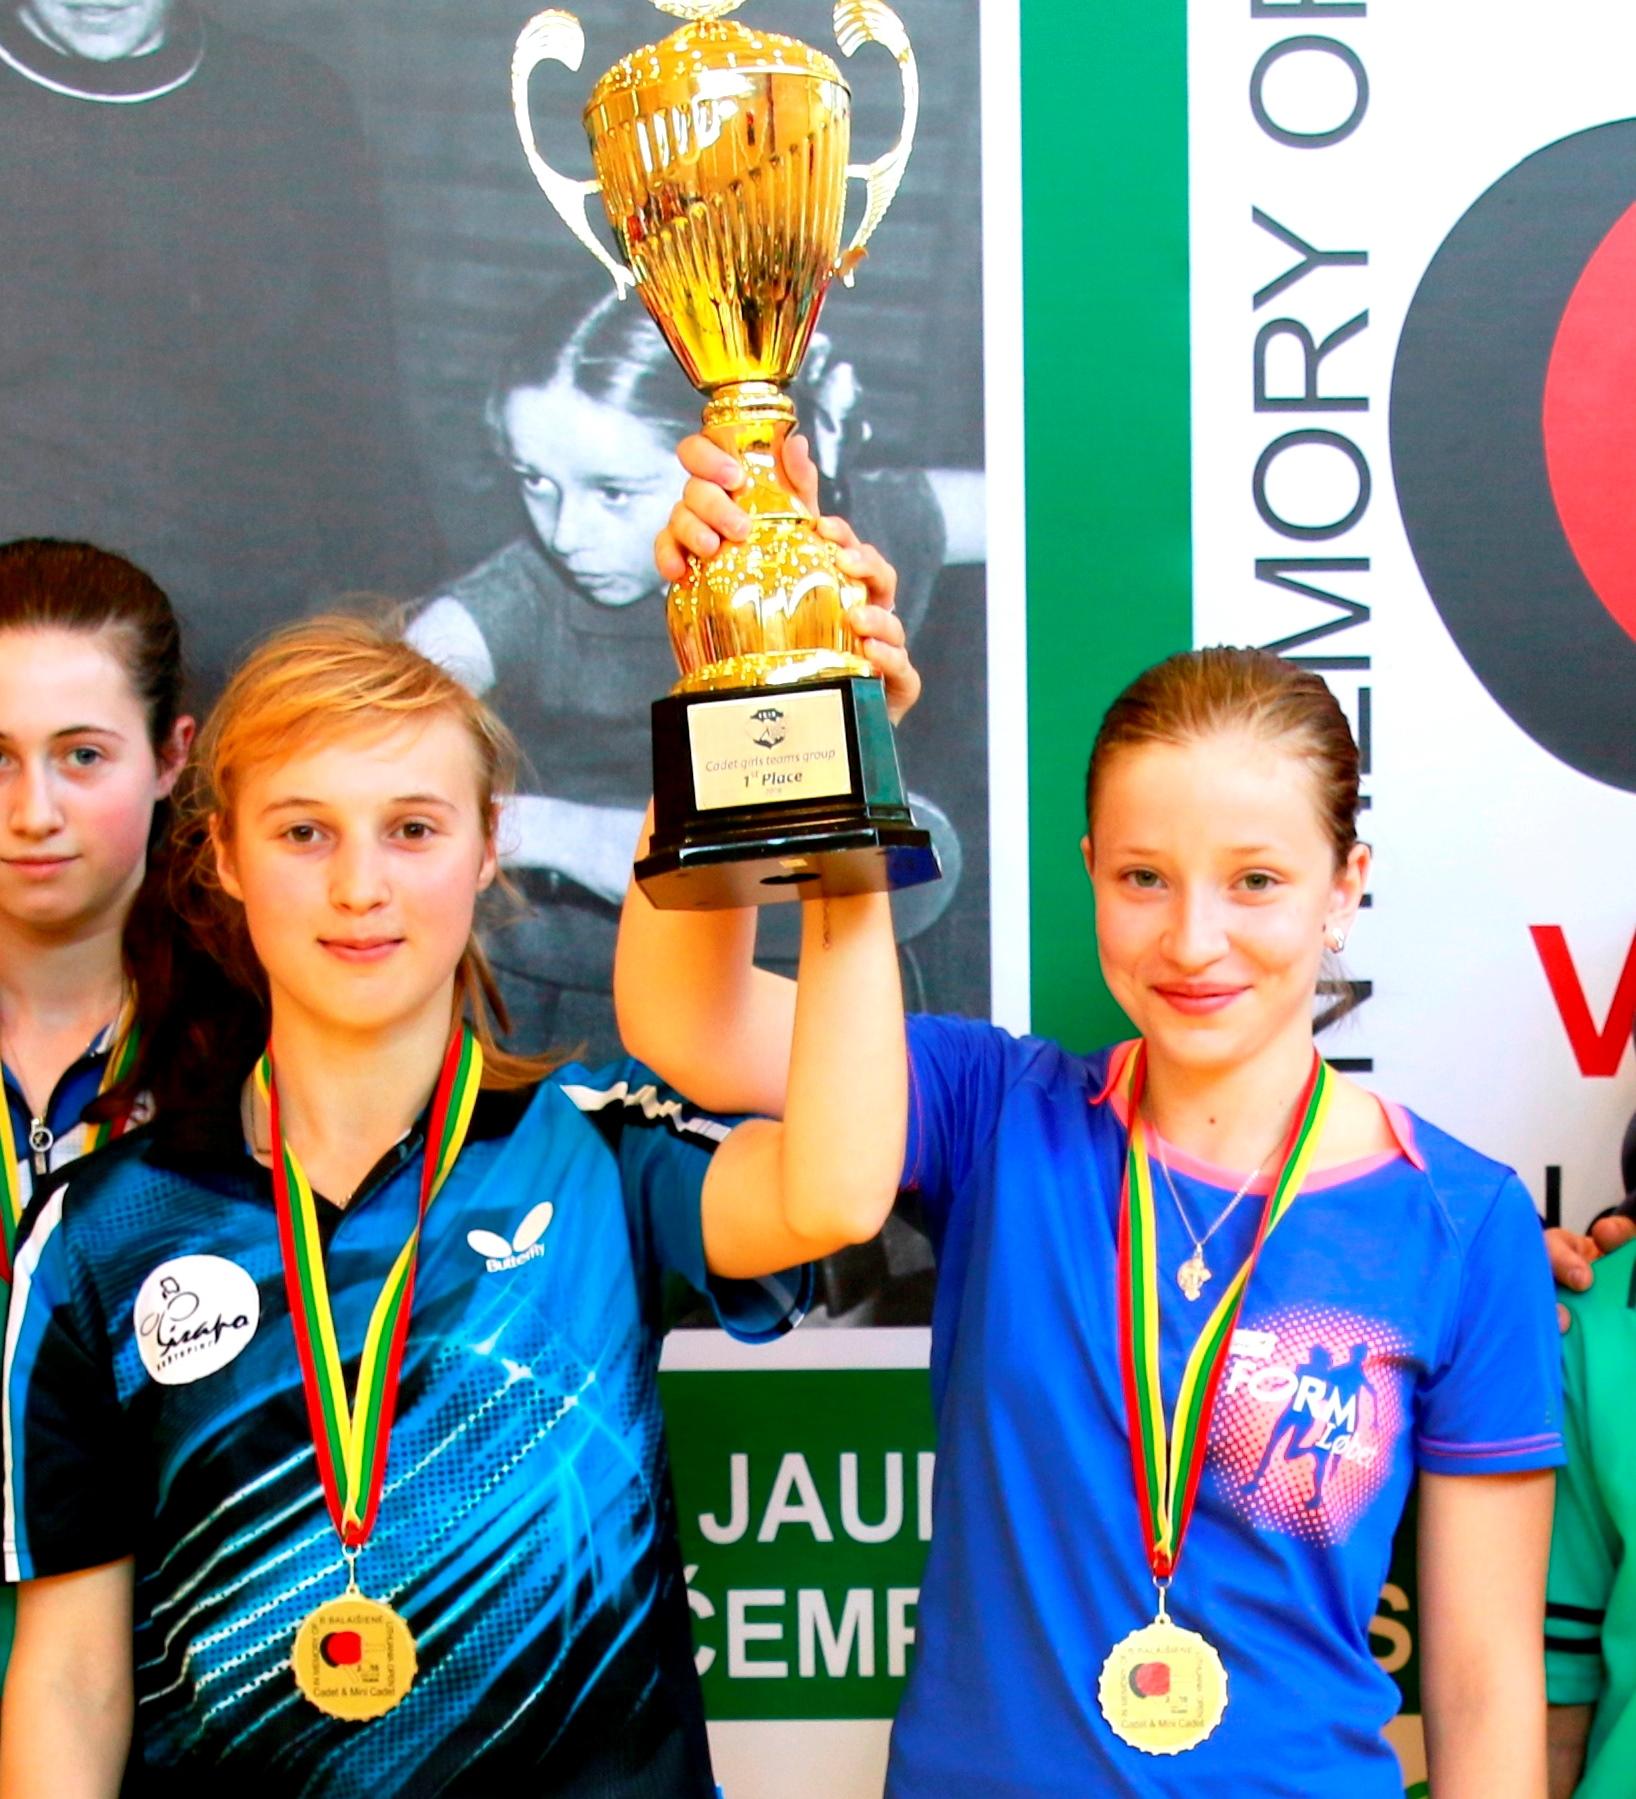 Александра Цюпко и Вероника Перебийнис - чемпионки турнира